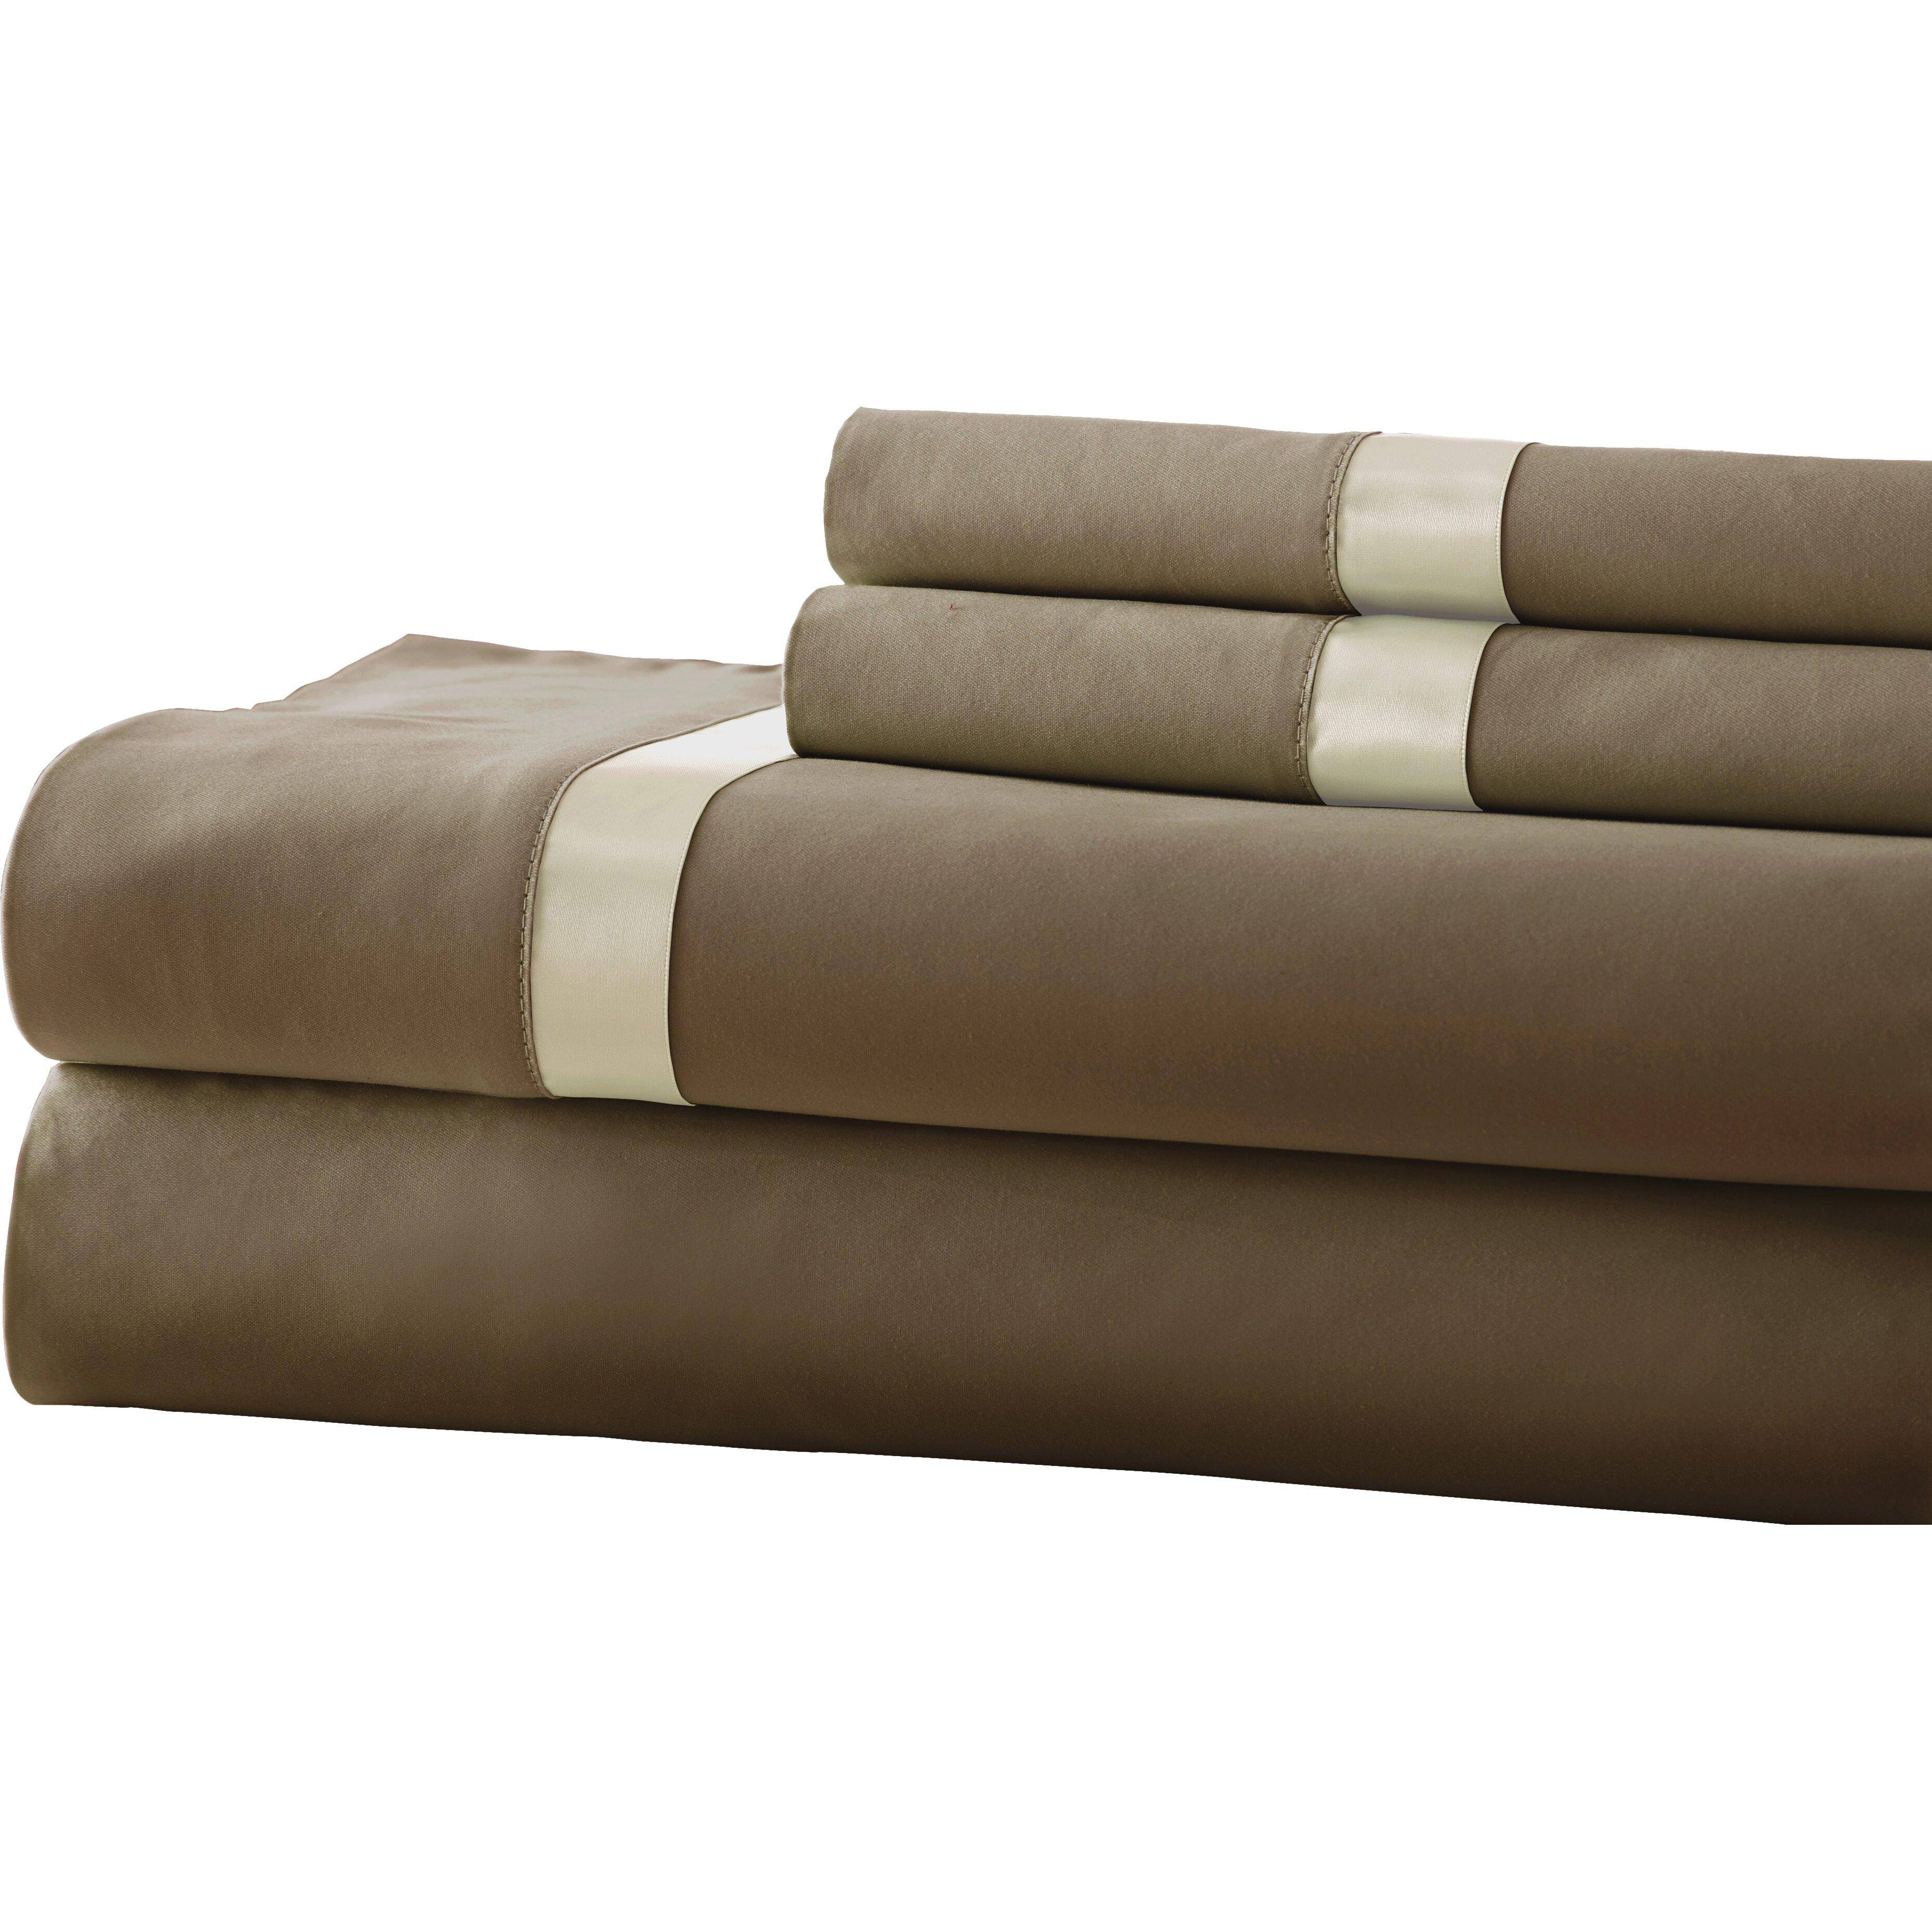 amrapur fine linens 400 thread count sheet set reviews wayfair. Black Bedroom Furniture Sets. Home Design Ideas